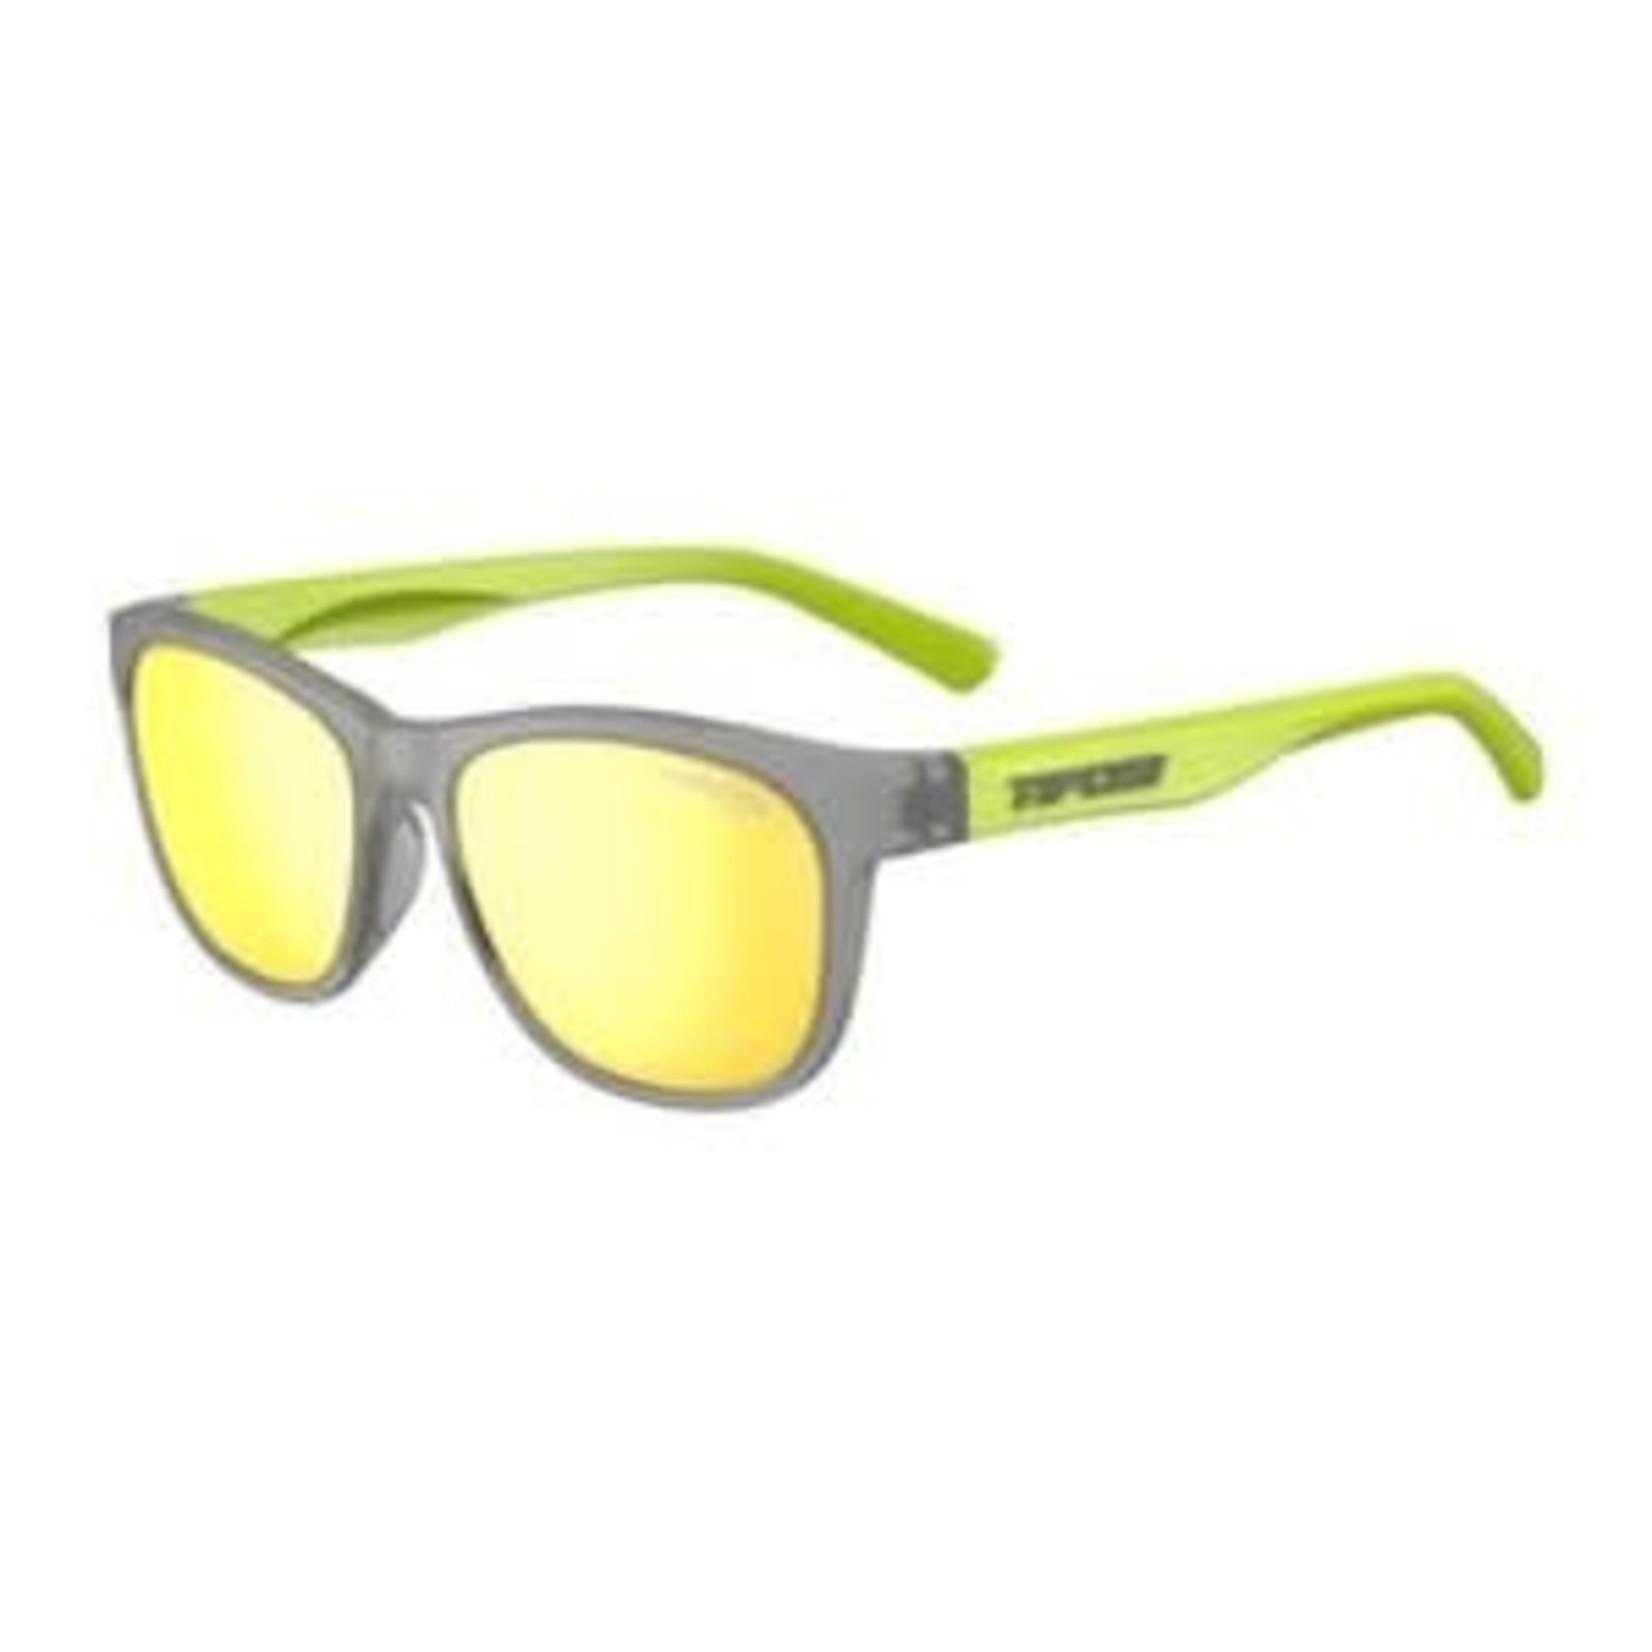 Tifosi Optics Swank, Vapor/Neon Single Lens Sunglasses Smoke Yellow